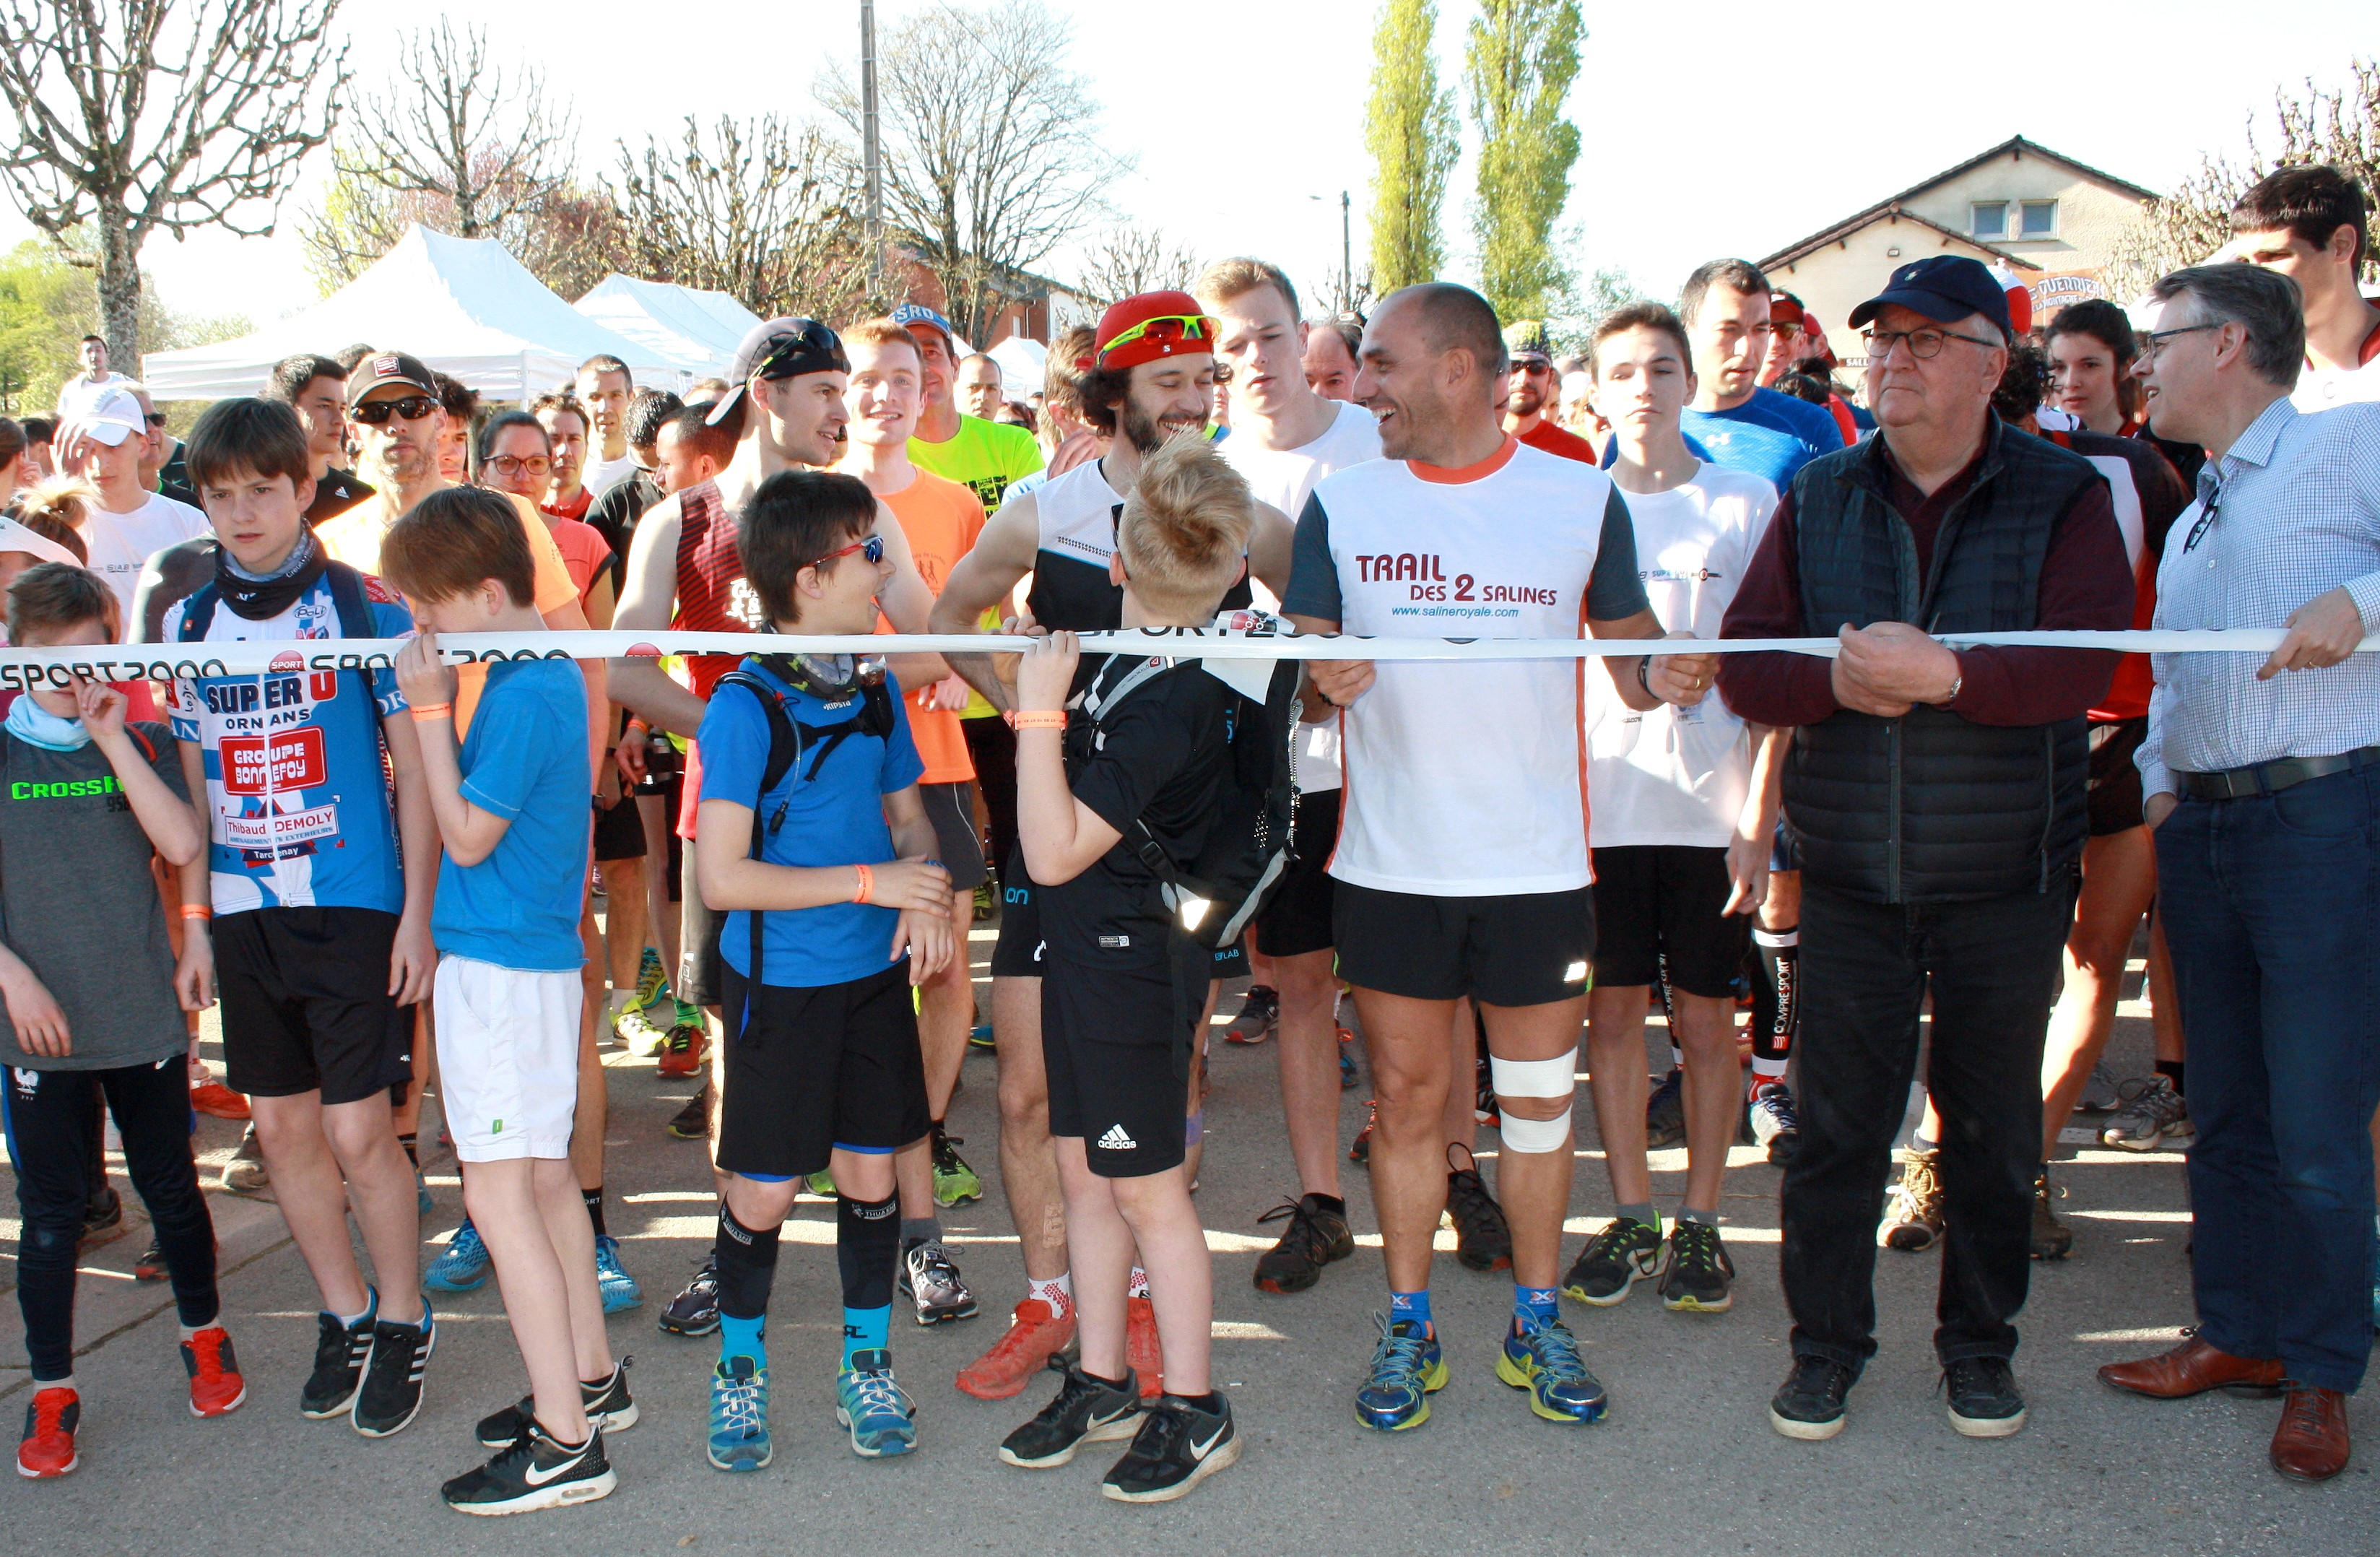 2017-04-09 - Trail-Montfaucon (111)